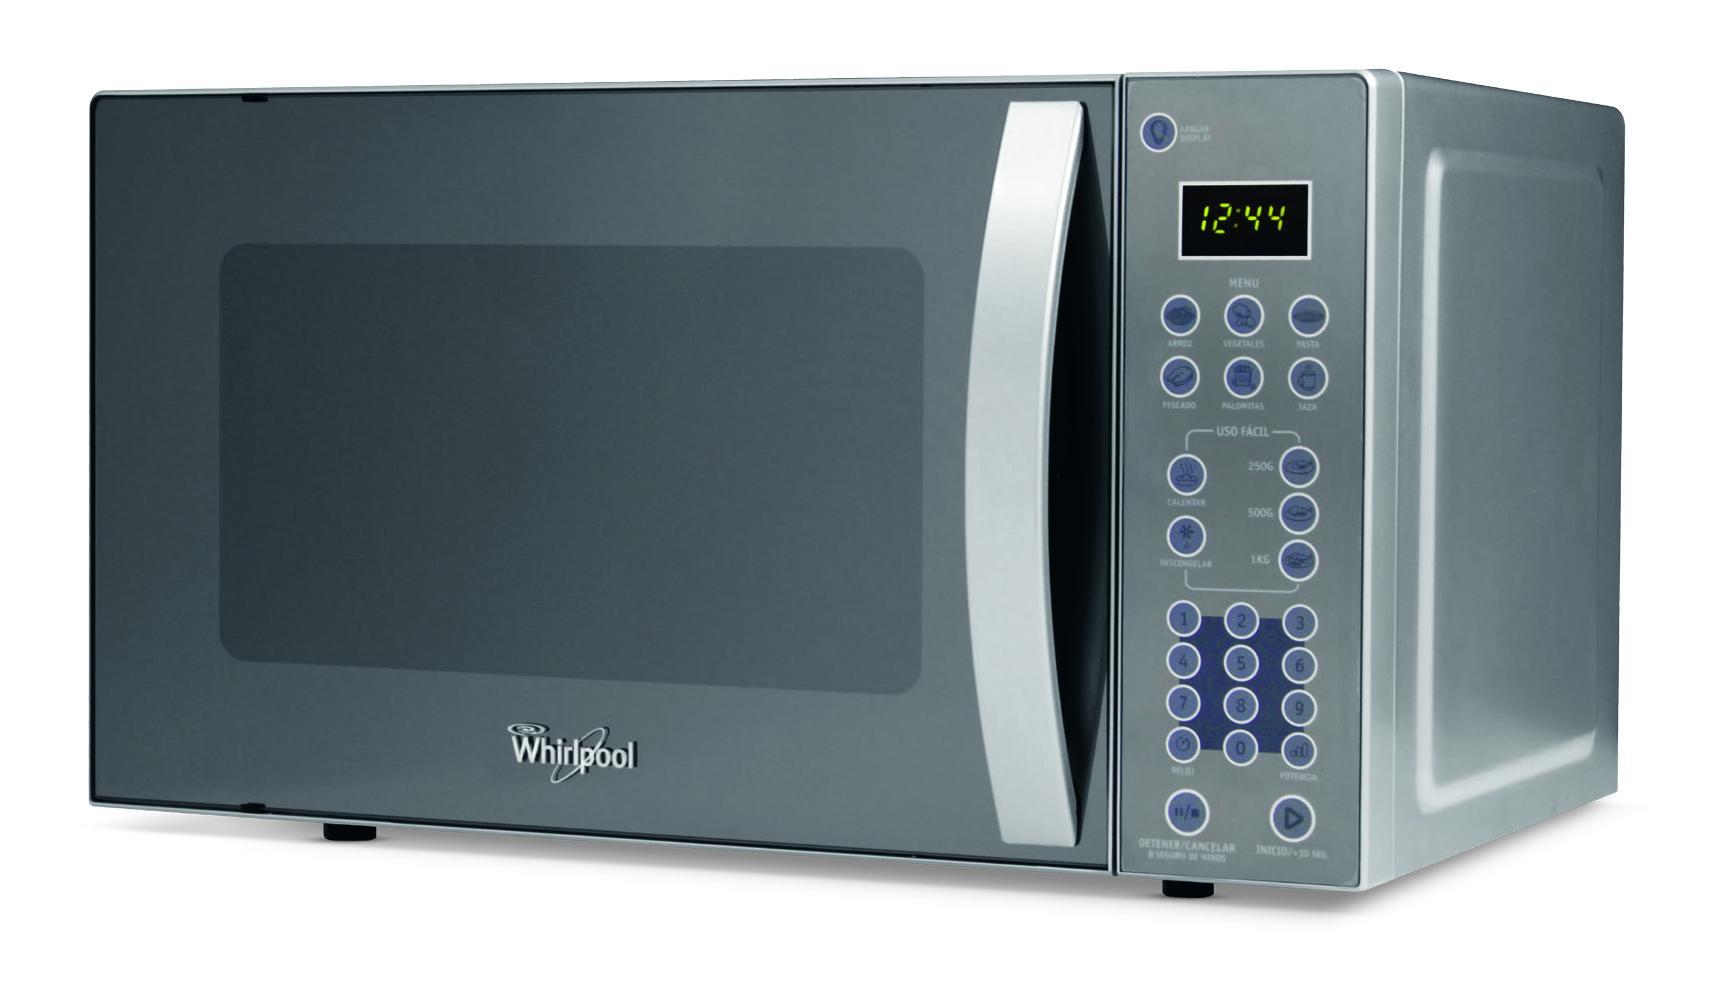 MICROONDAS WHIRLPOOL S11WMS07ZDBS